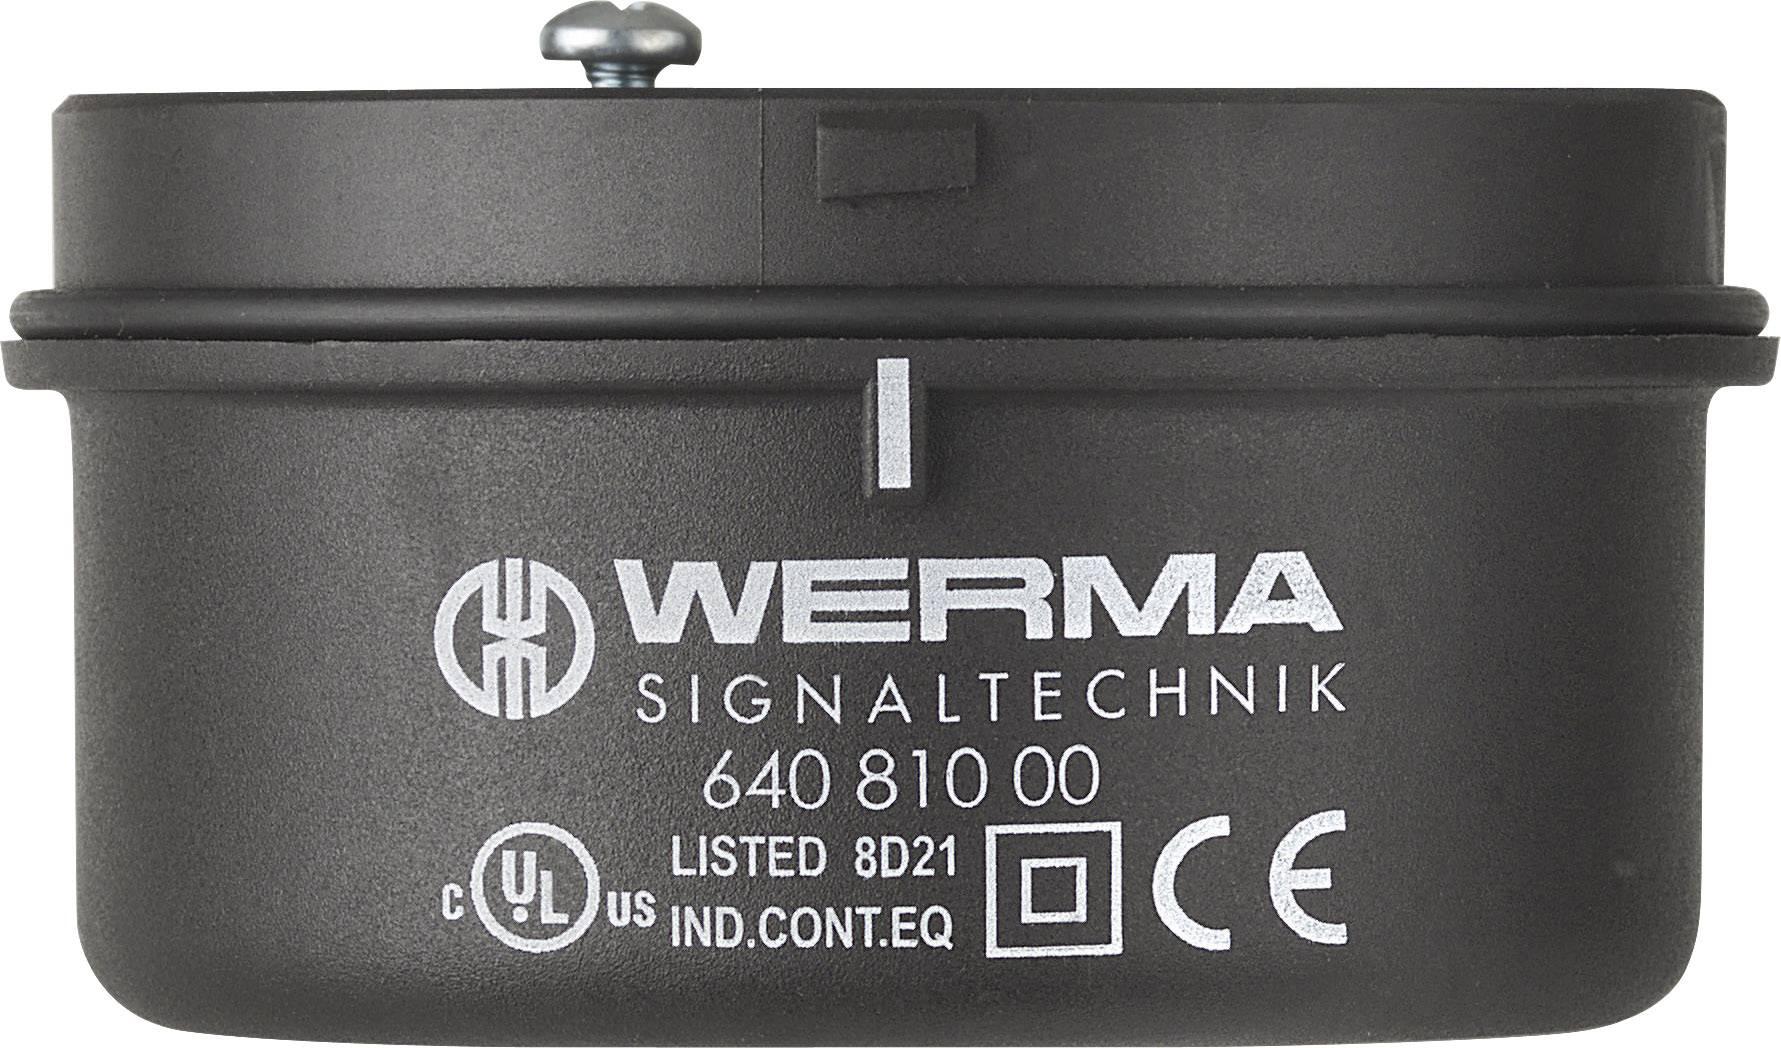 Príslušenstvo pre montáž Werma Signaltechnik 640.810.00 KombiSIGN 71